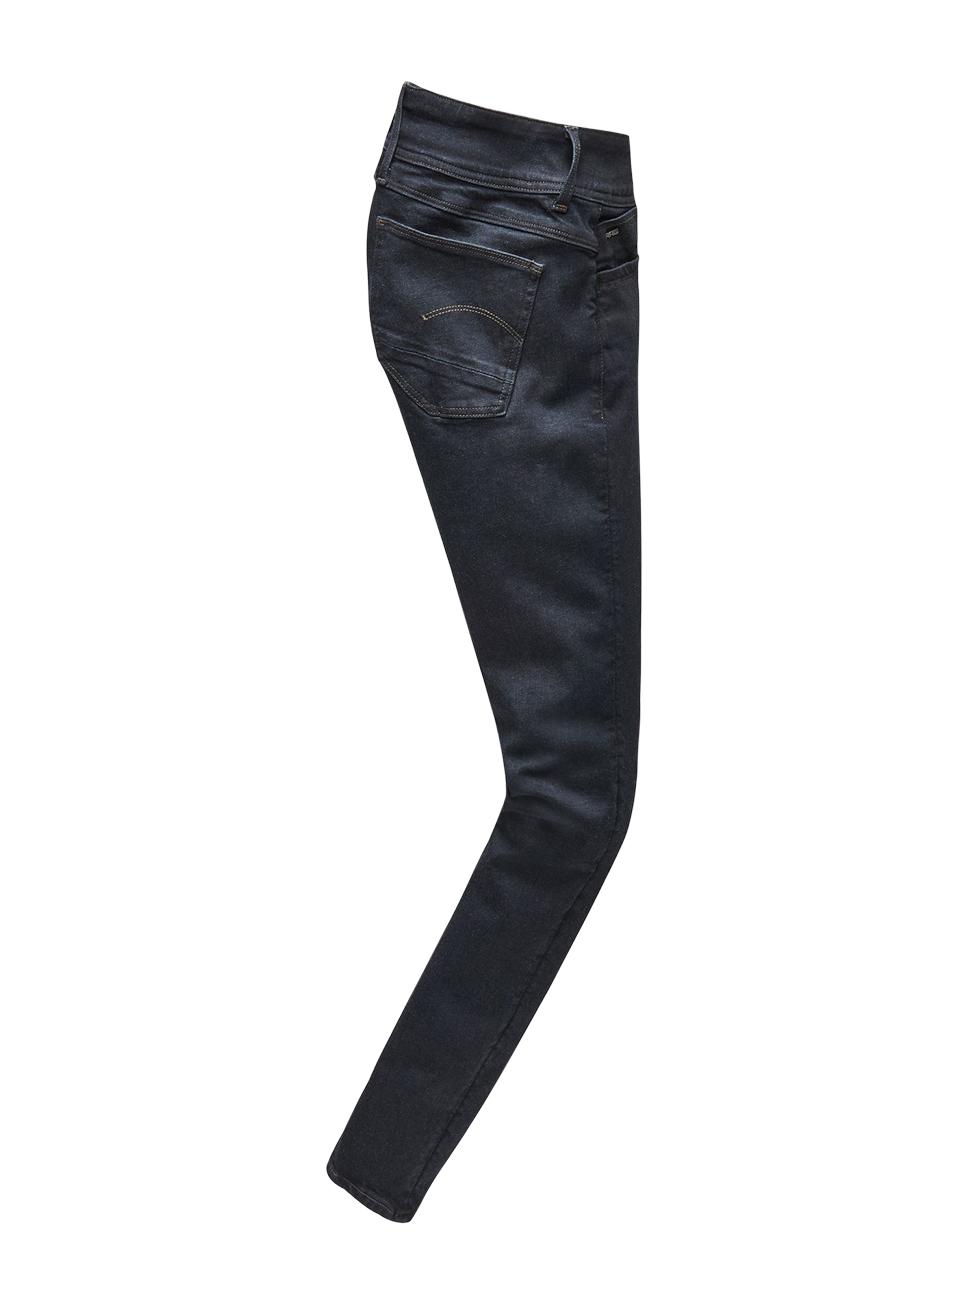 g-star-damen-jeans-lynn-d-mid-super-skinny-fit-blau-rinsed, 39.95 EUR @ jeans